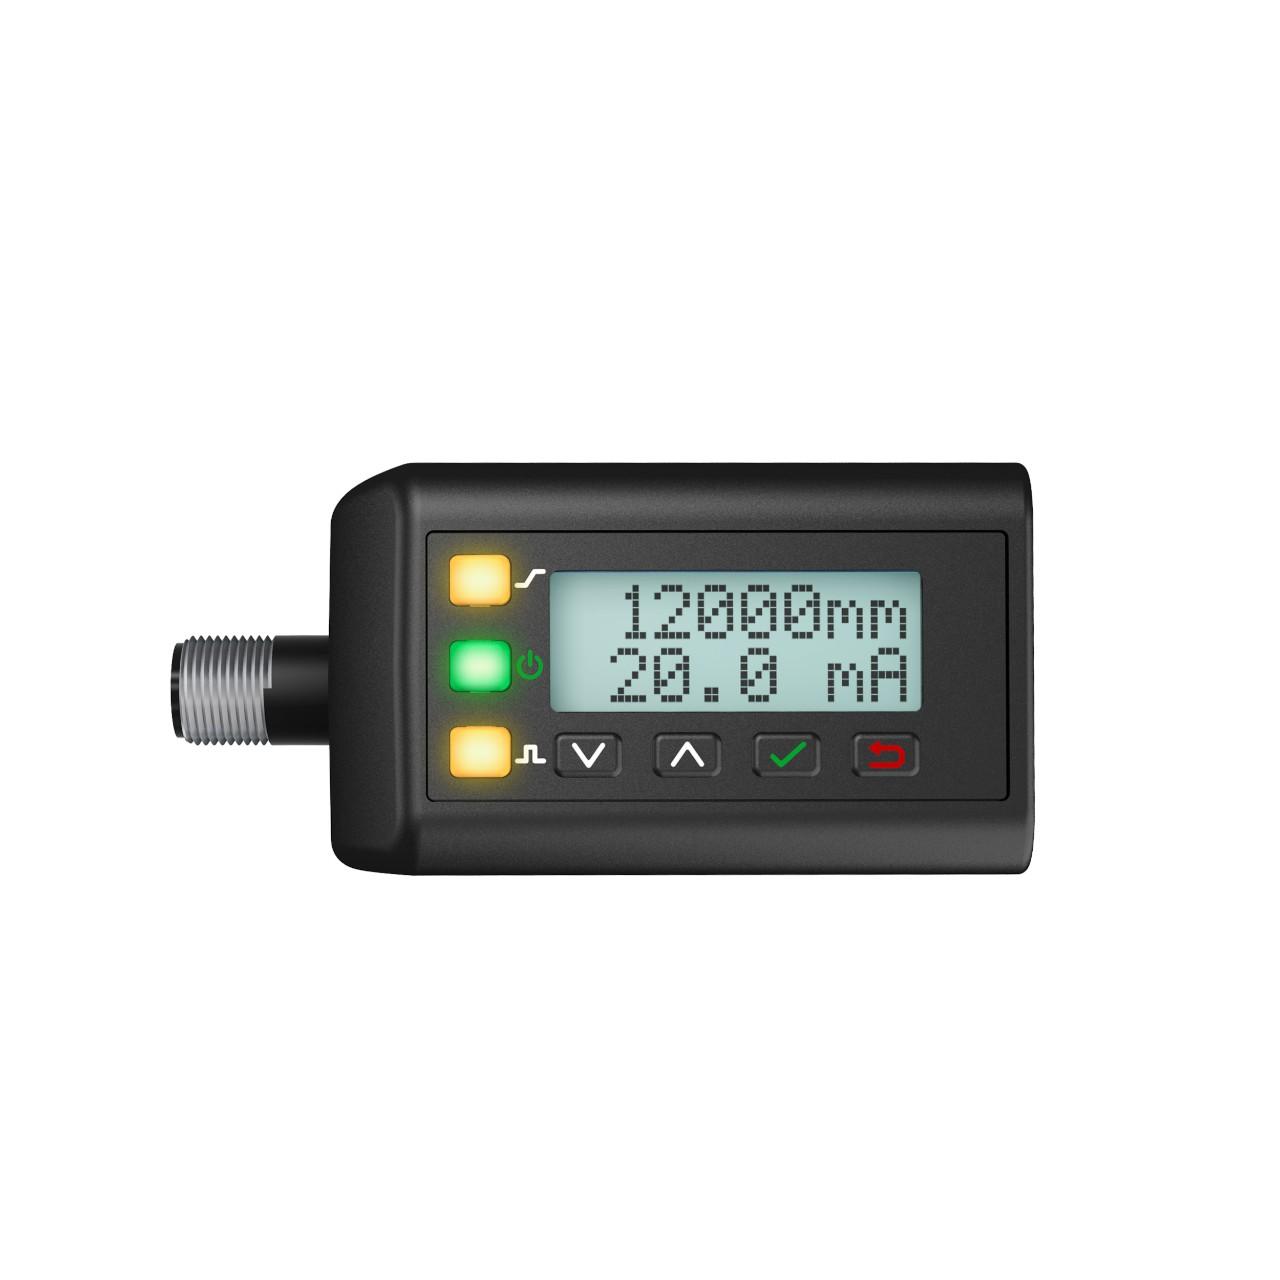 Laser Sensor Ltf12ic2ldq 50 12000mm 4 20ma Npn Pnp Level Sensors Turck Wiring Diagram